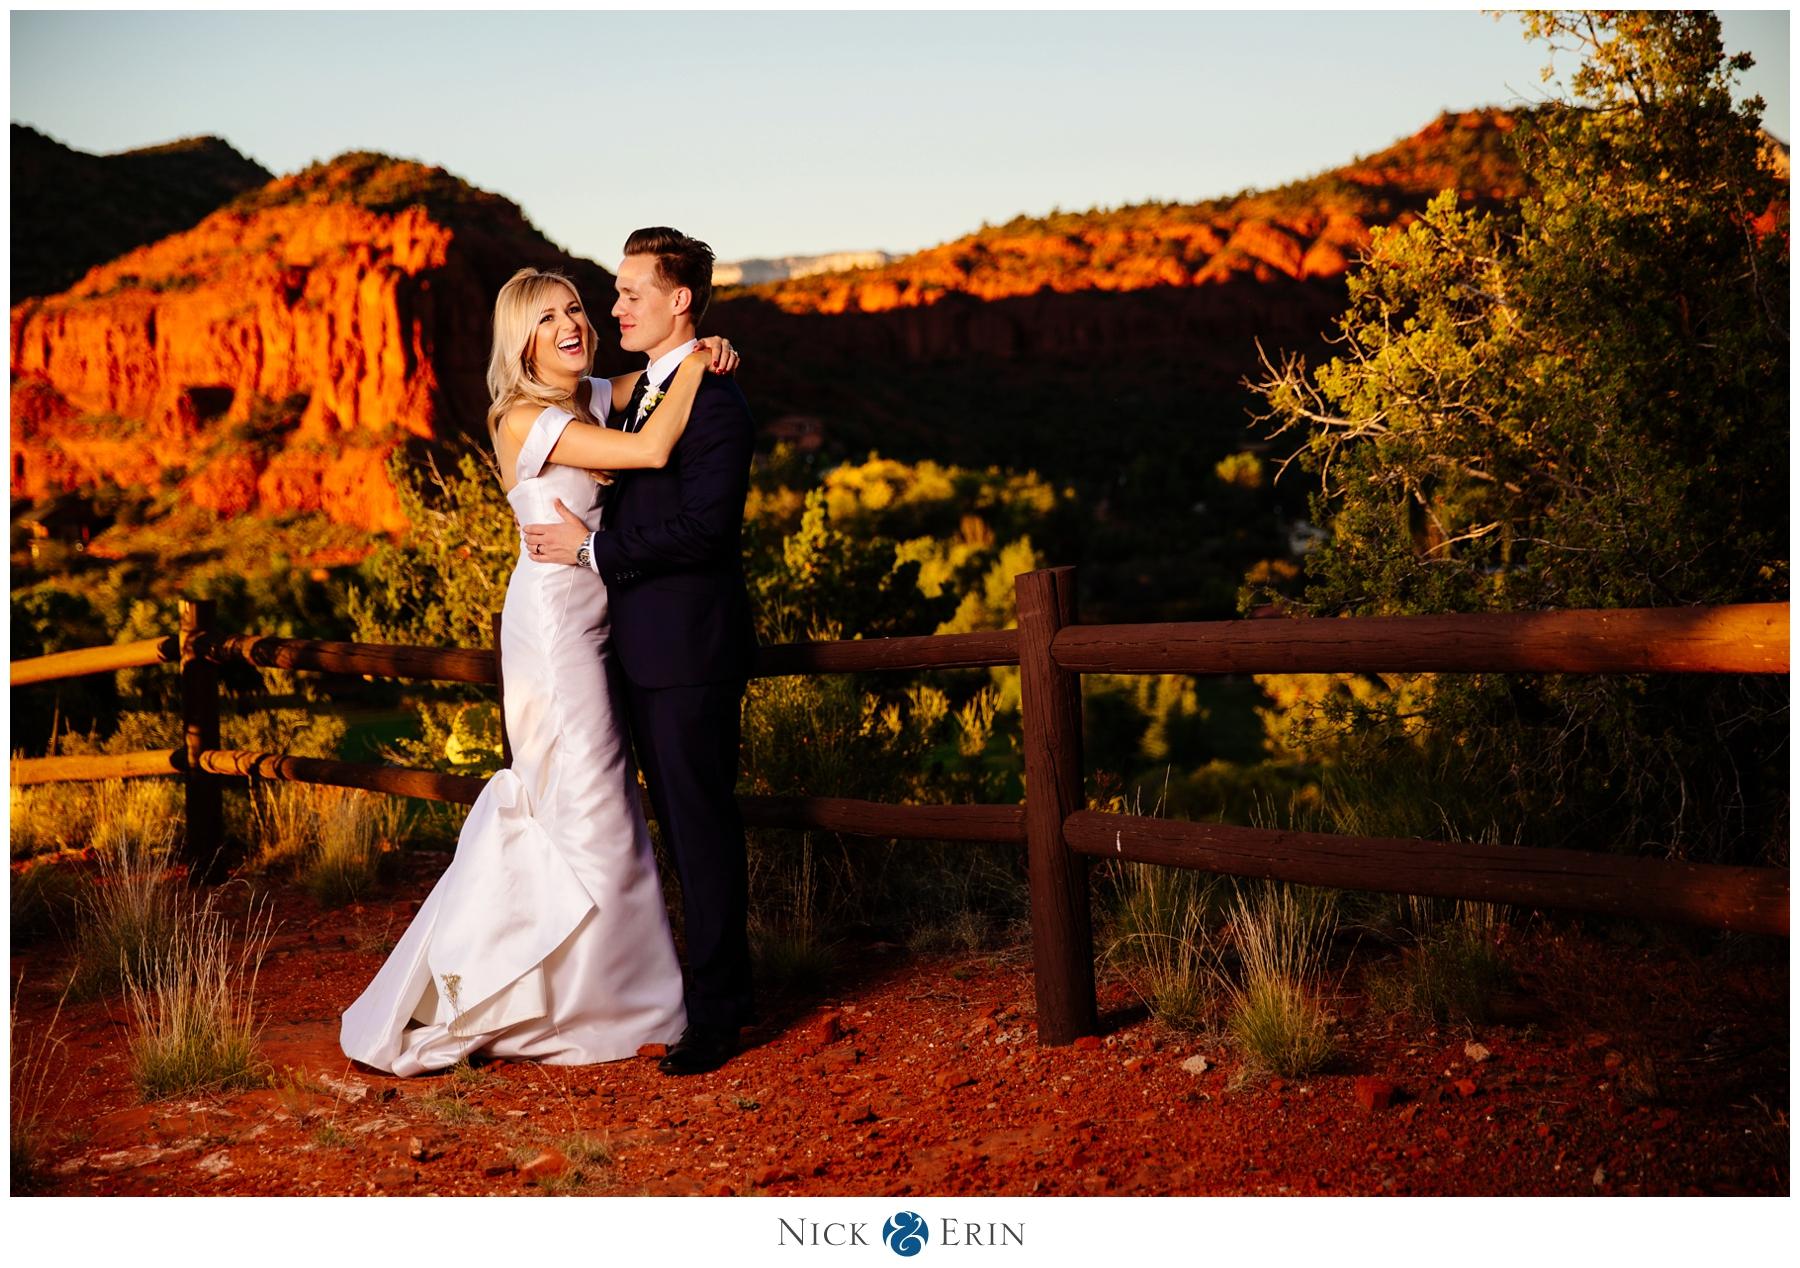 Donner_Photography_Sedona Arizona Wedding_Alissa and Tom_0006